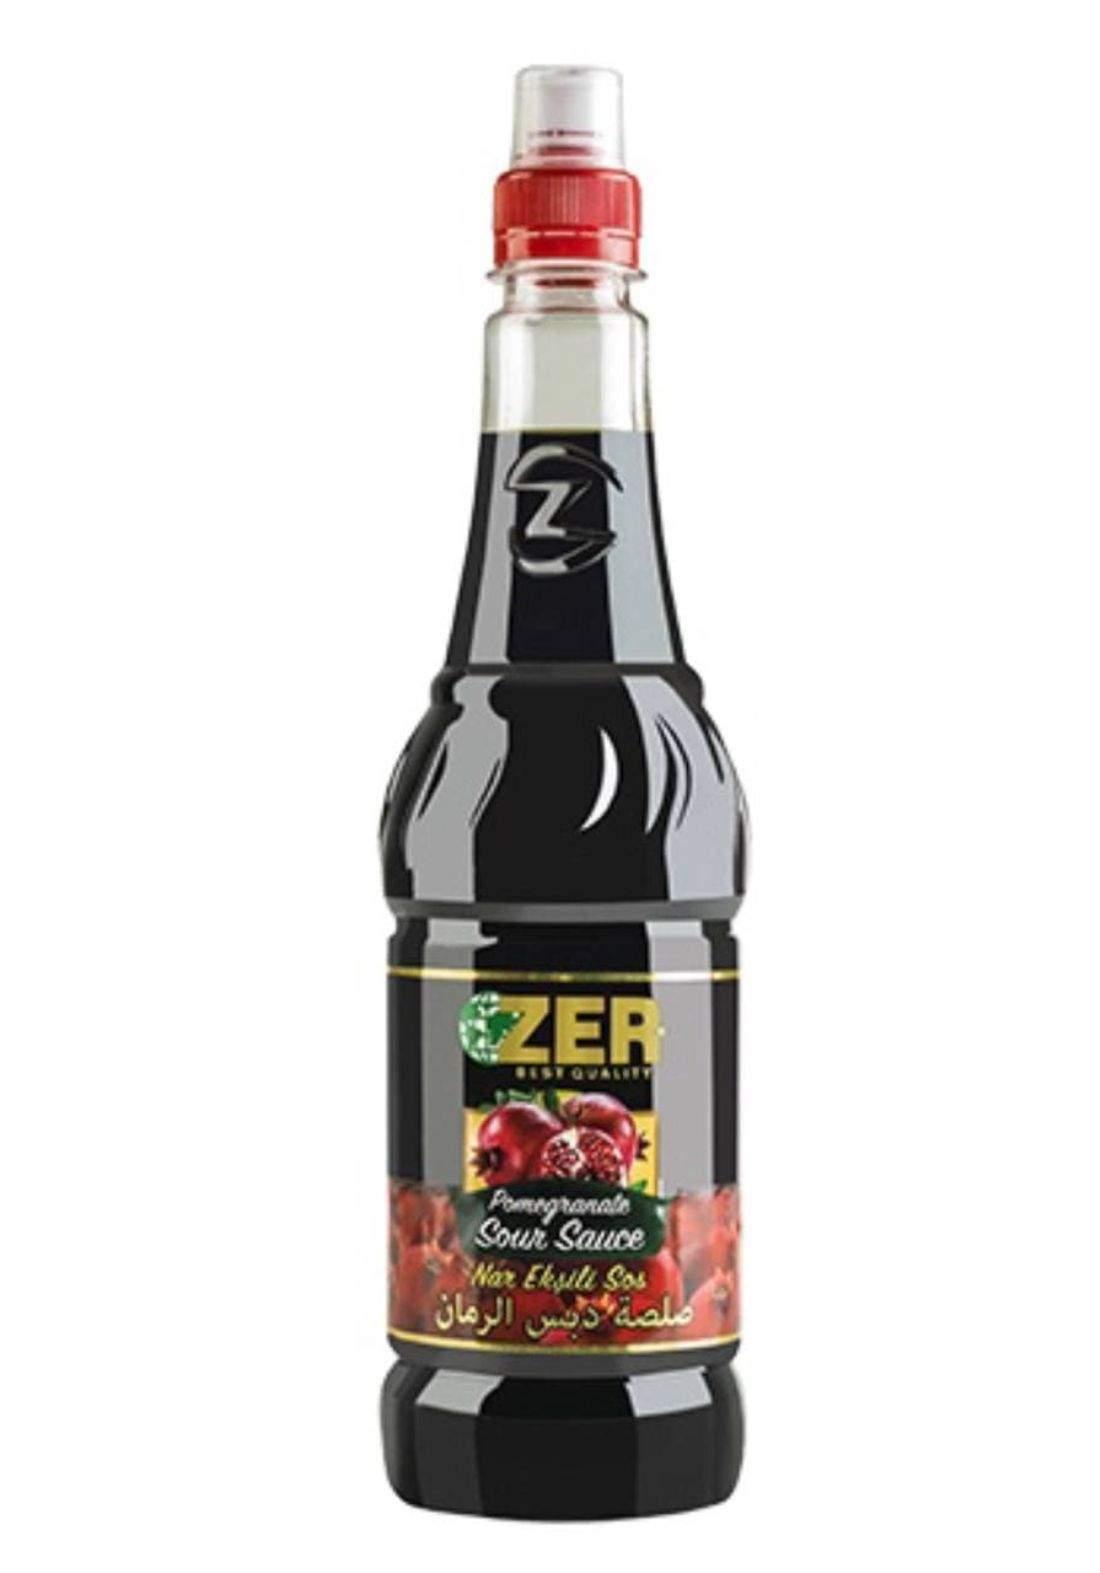 Zer pomegranate sour sauce 1000g زير دبس الرمان